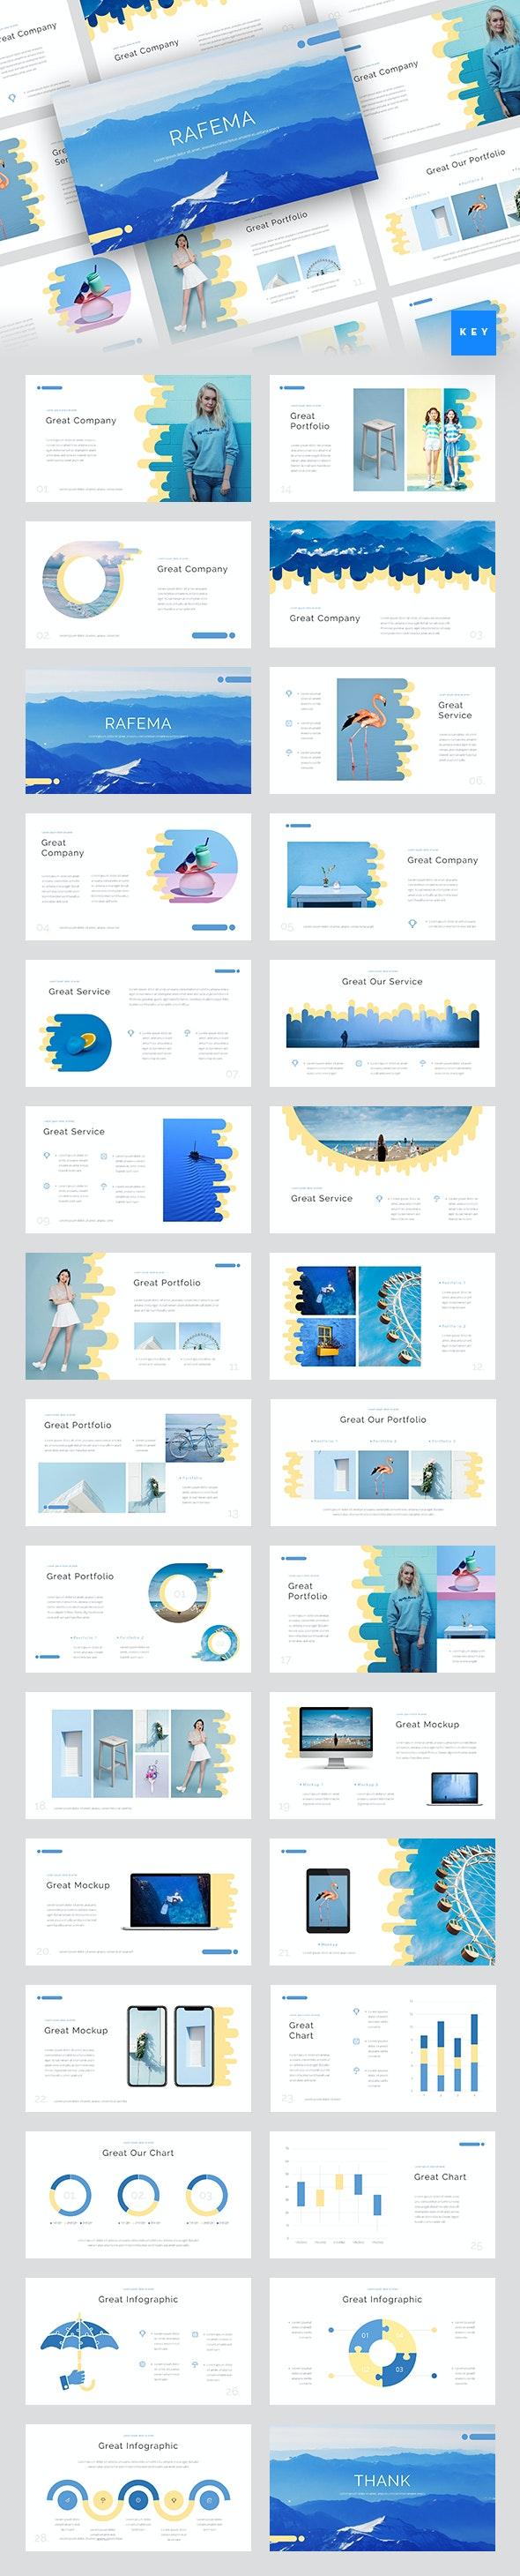 Rafema - Creative Keynote Template - Creative Keynote Templates